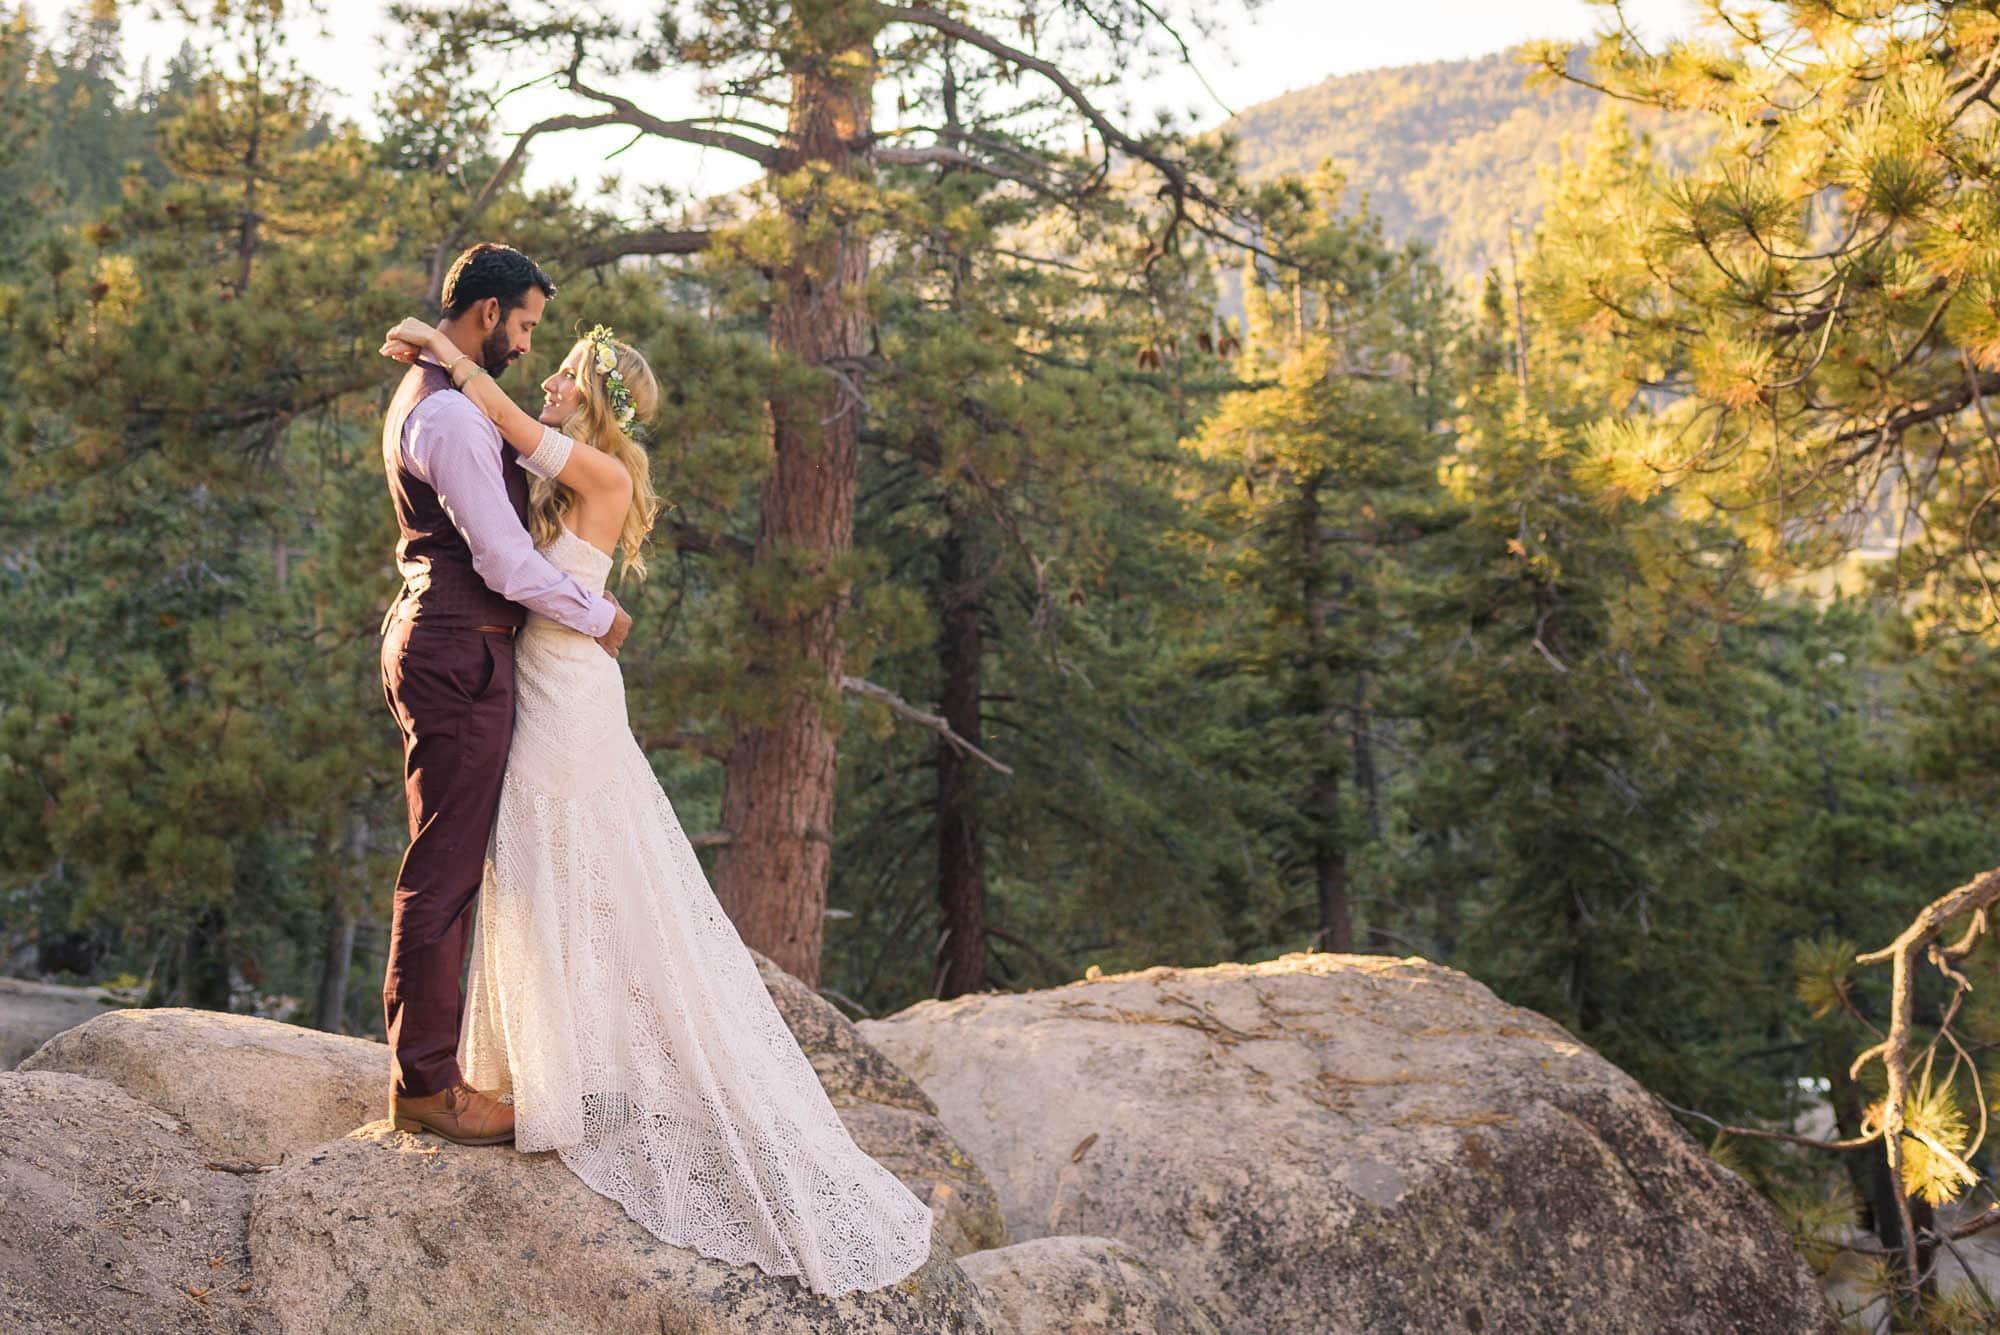 037_Alan_and_Heidi_Wedding_Natalie_Mike